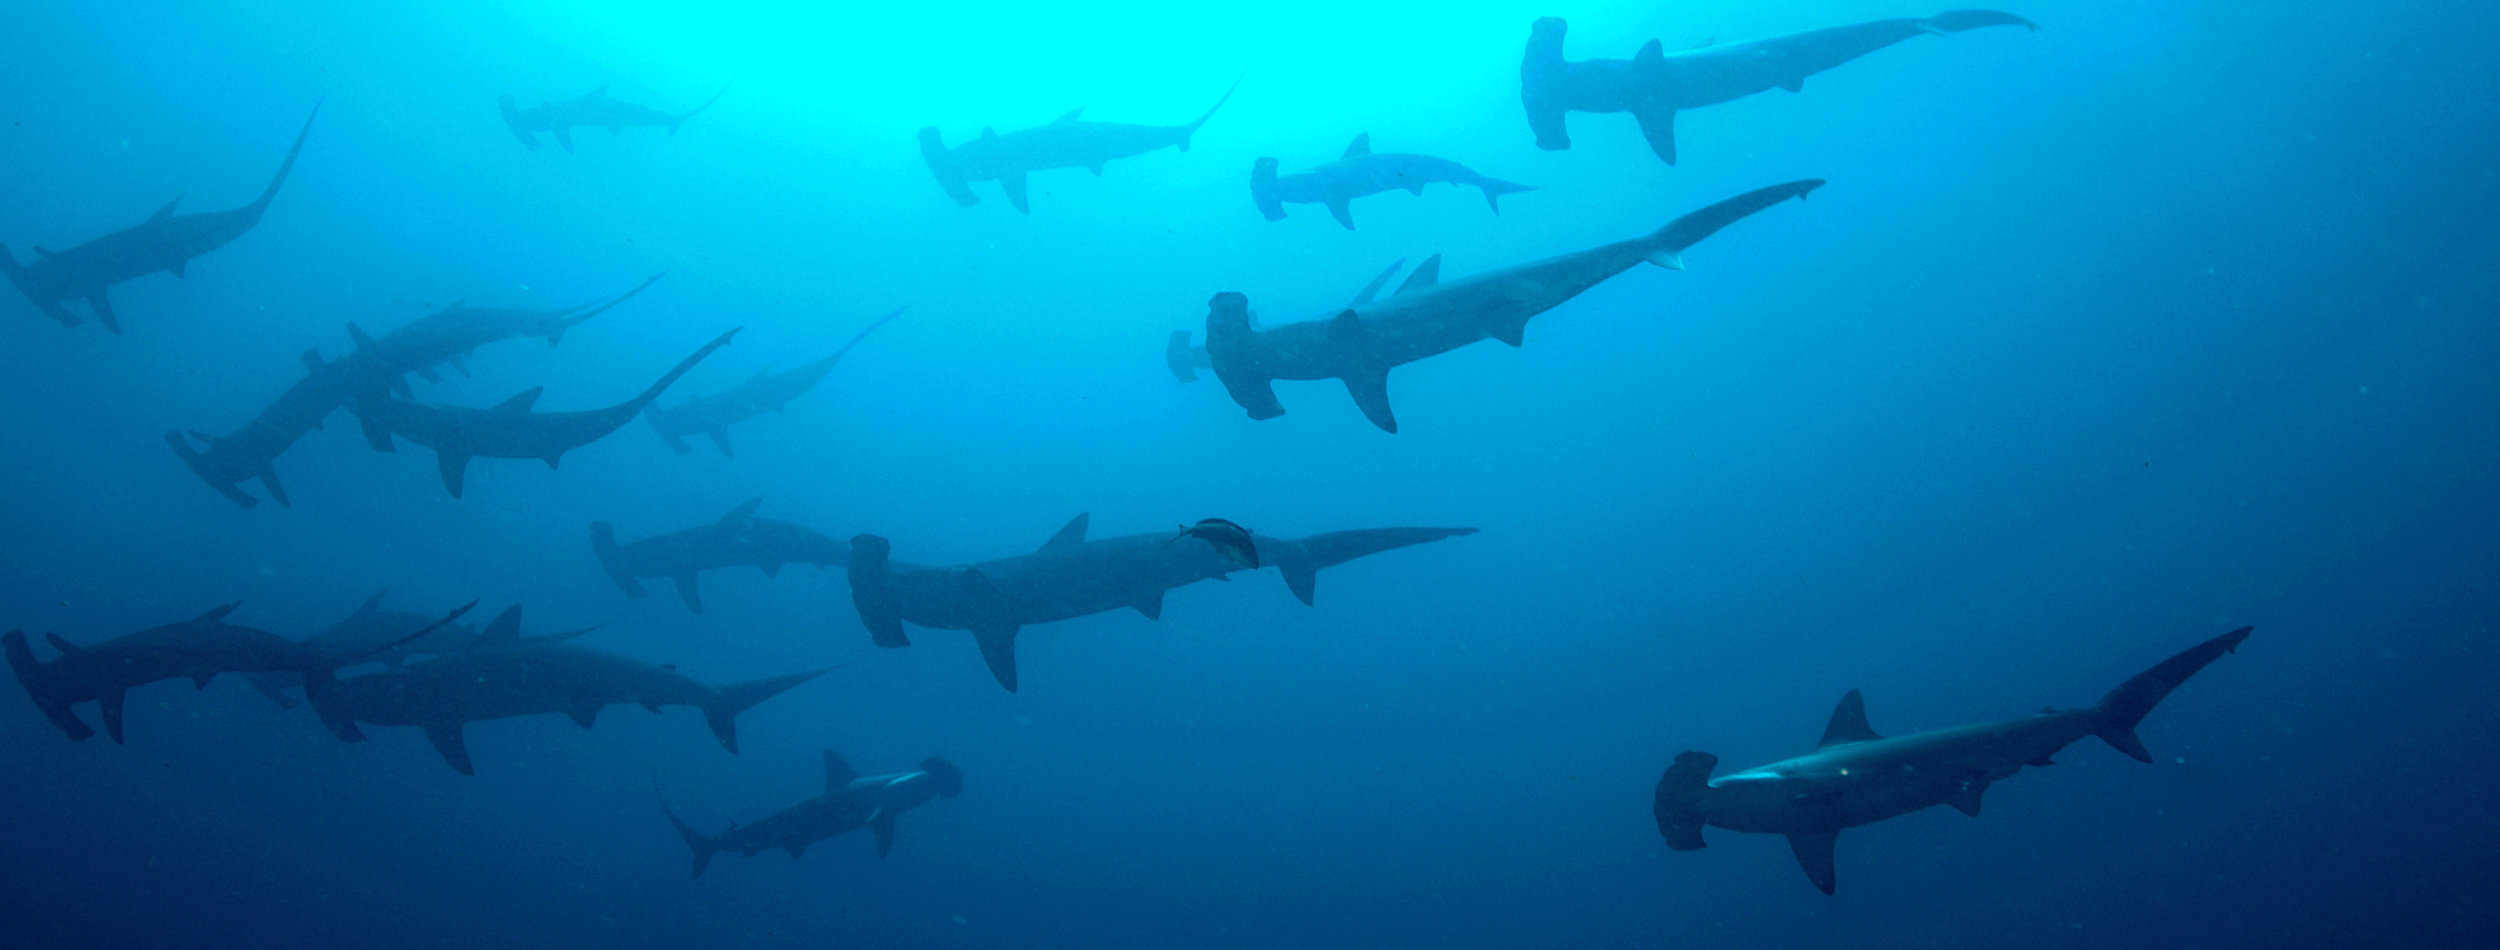 SharksSwimming